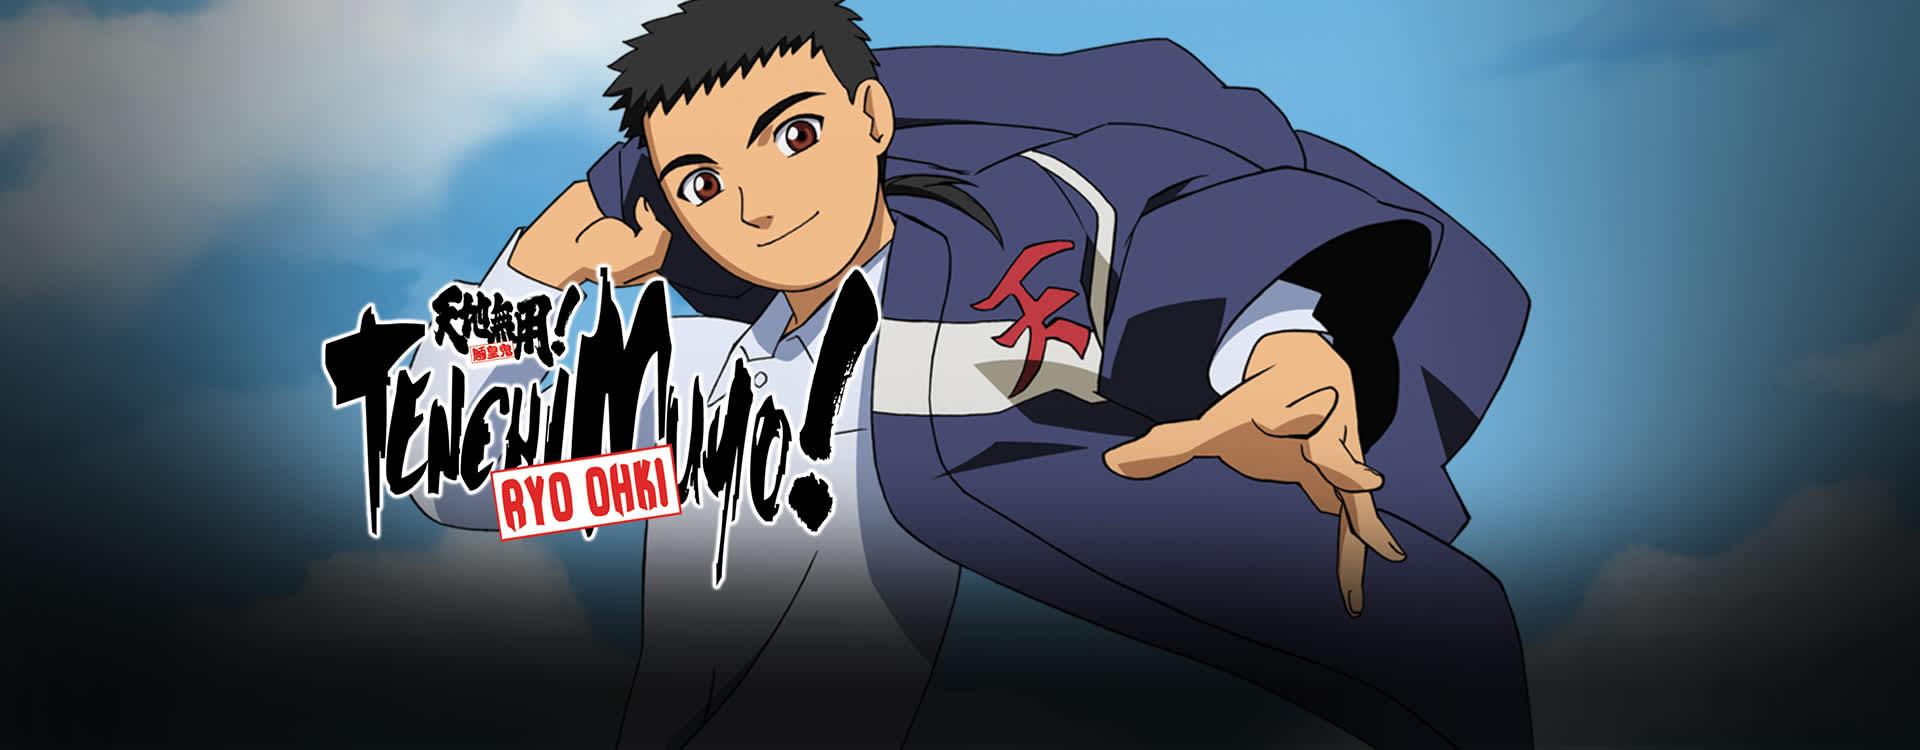 tenchi muyou! ryououki dai yon-ki